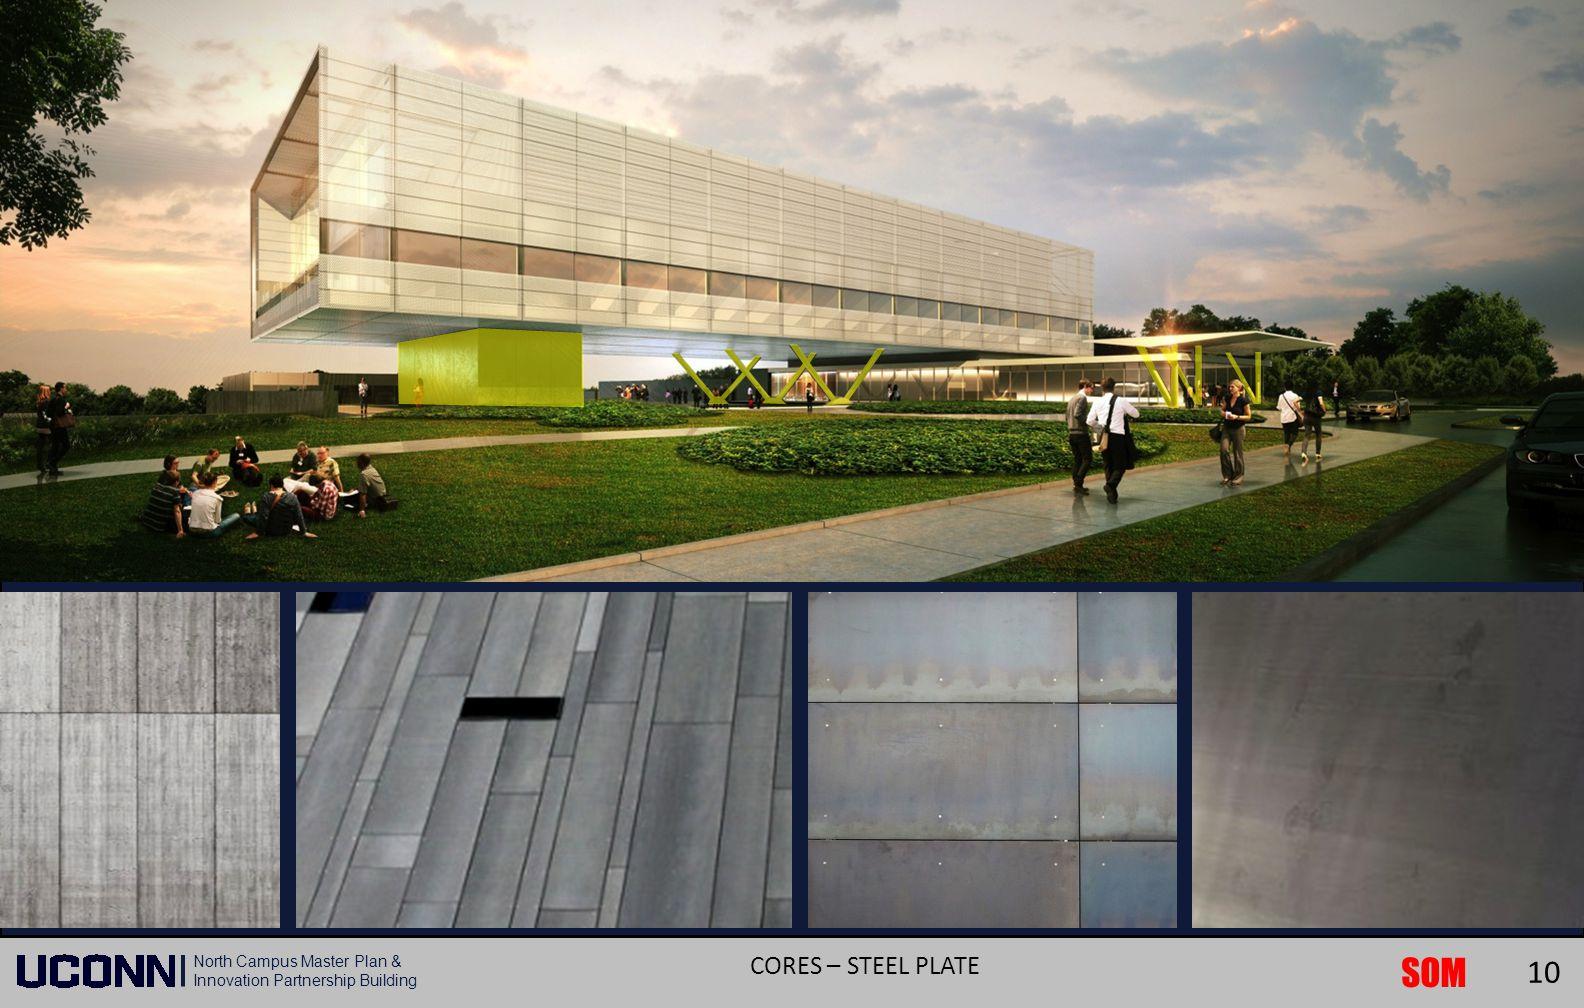 SOM North Campus Master Plan & Innovation Partnership Building CORES – STEEL PLATE 10